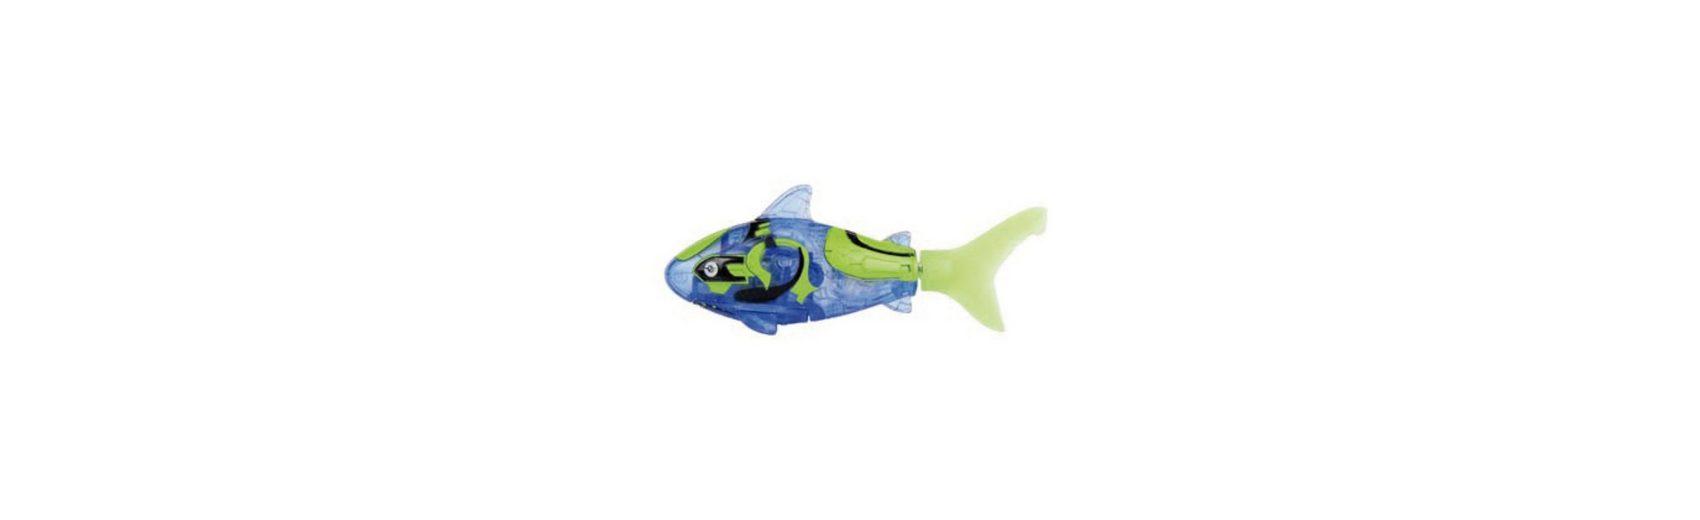 Goliath Robo Fish Shark Blue/Green